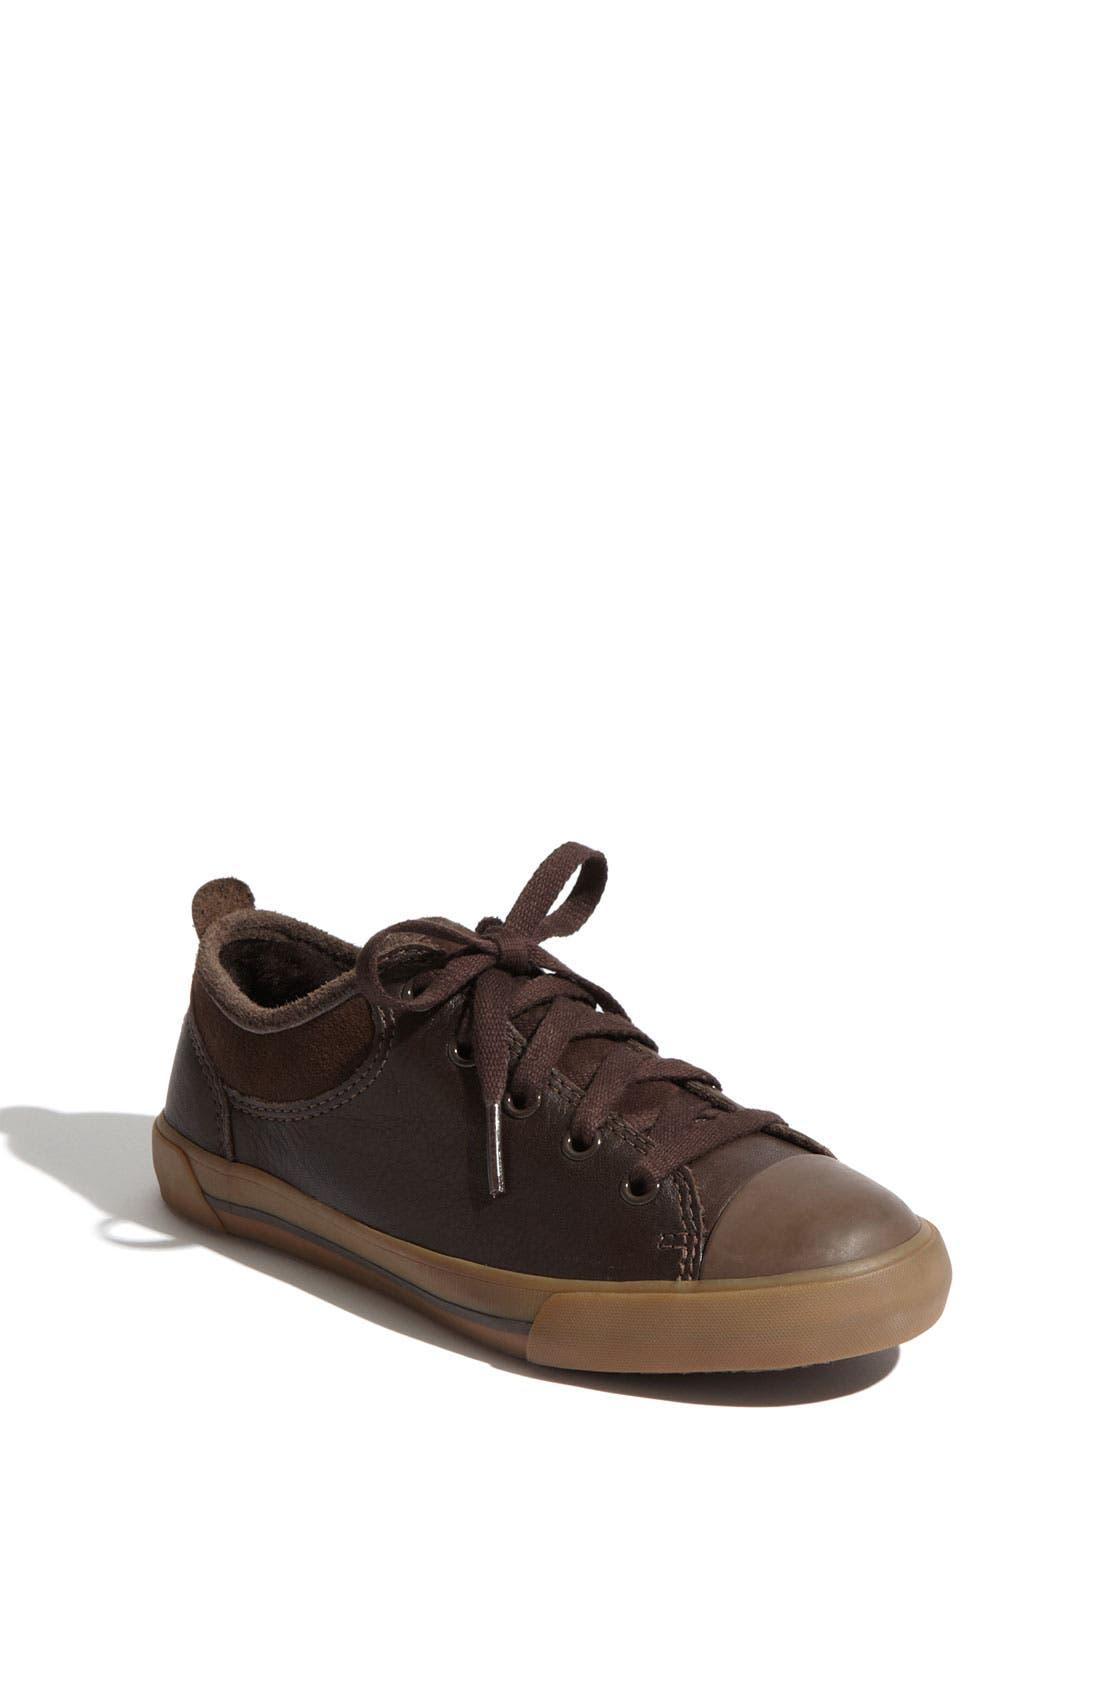 Main Image - UGG® Australia 'Kameron' Sneaker (Toddler, Little Kid & Big Kid)